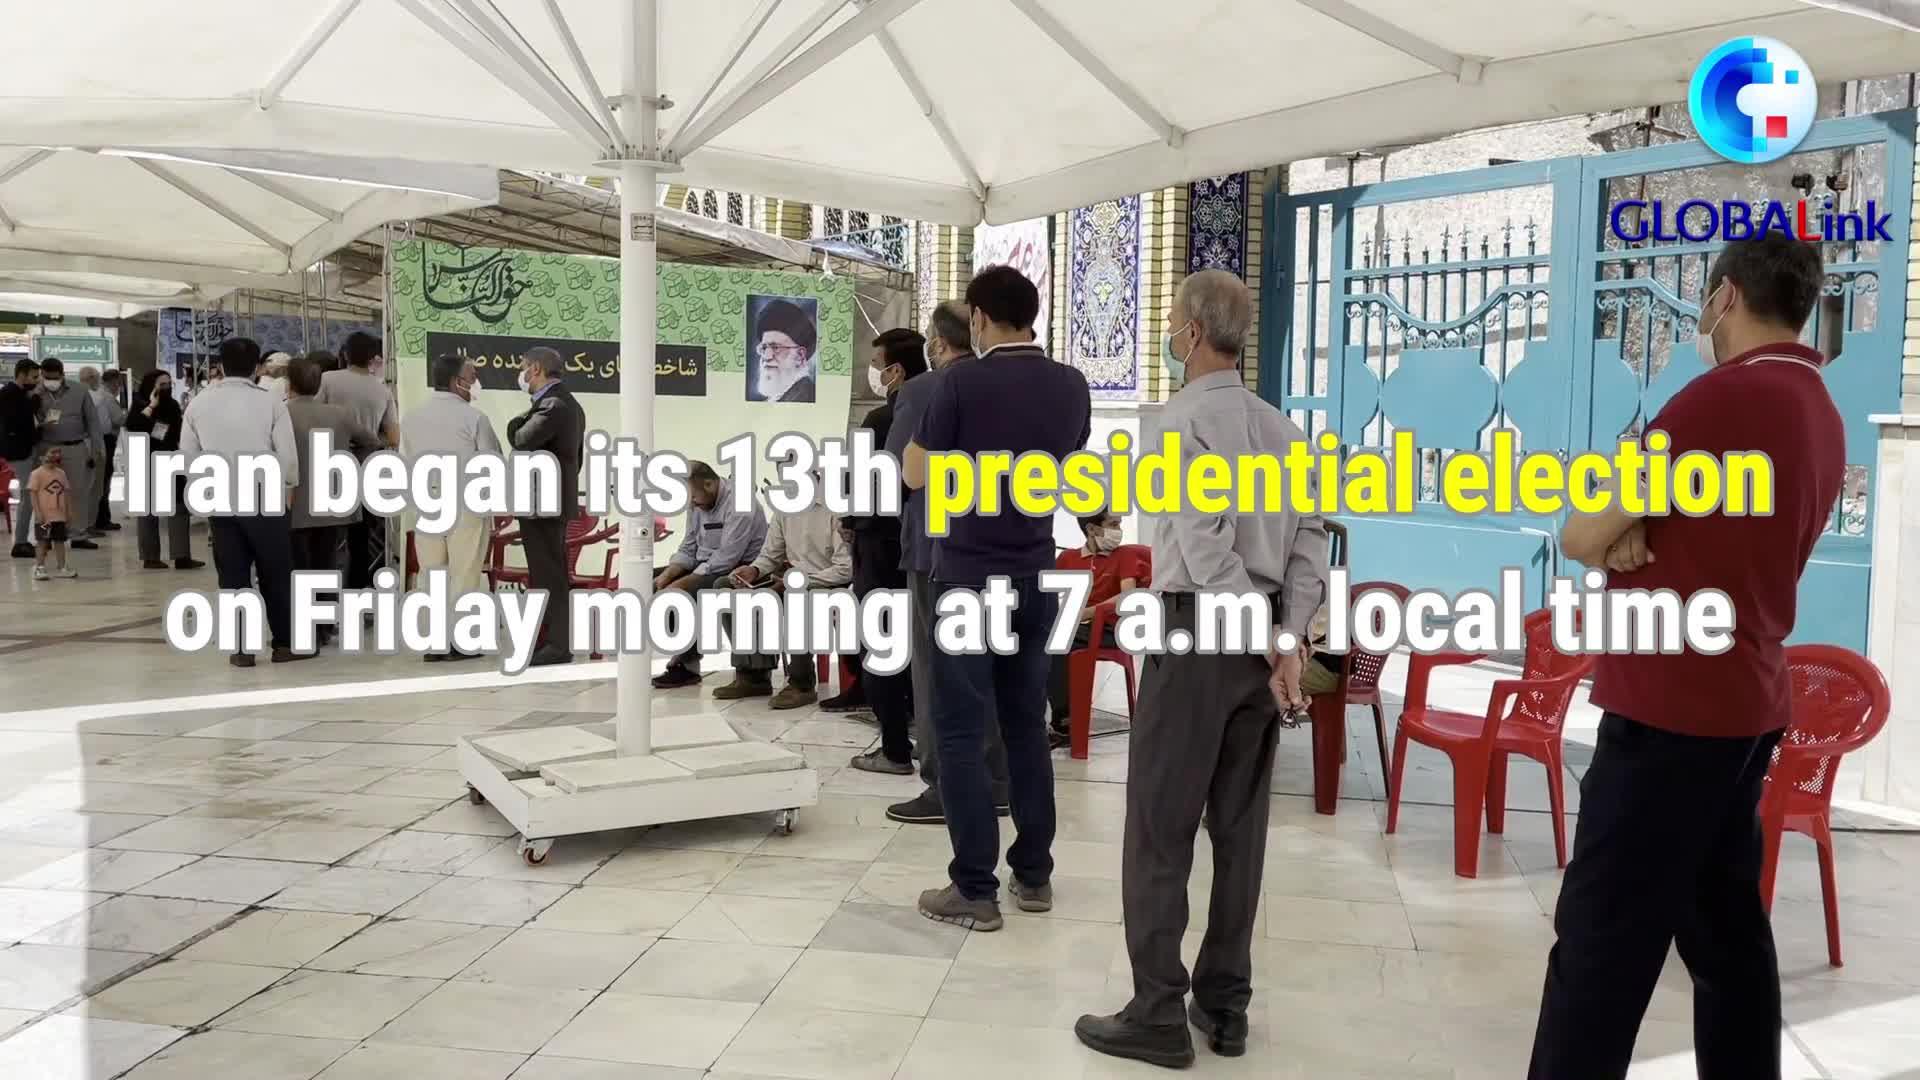 GLOBALink | Iran begins 13th presidential election